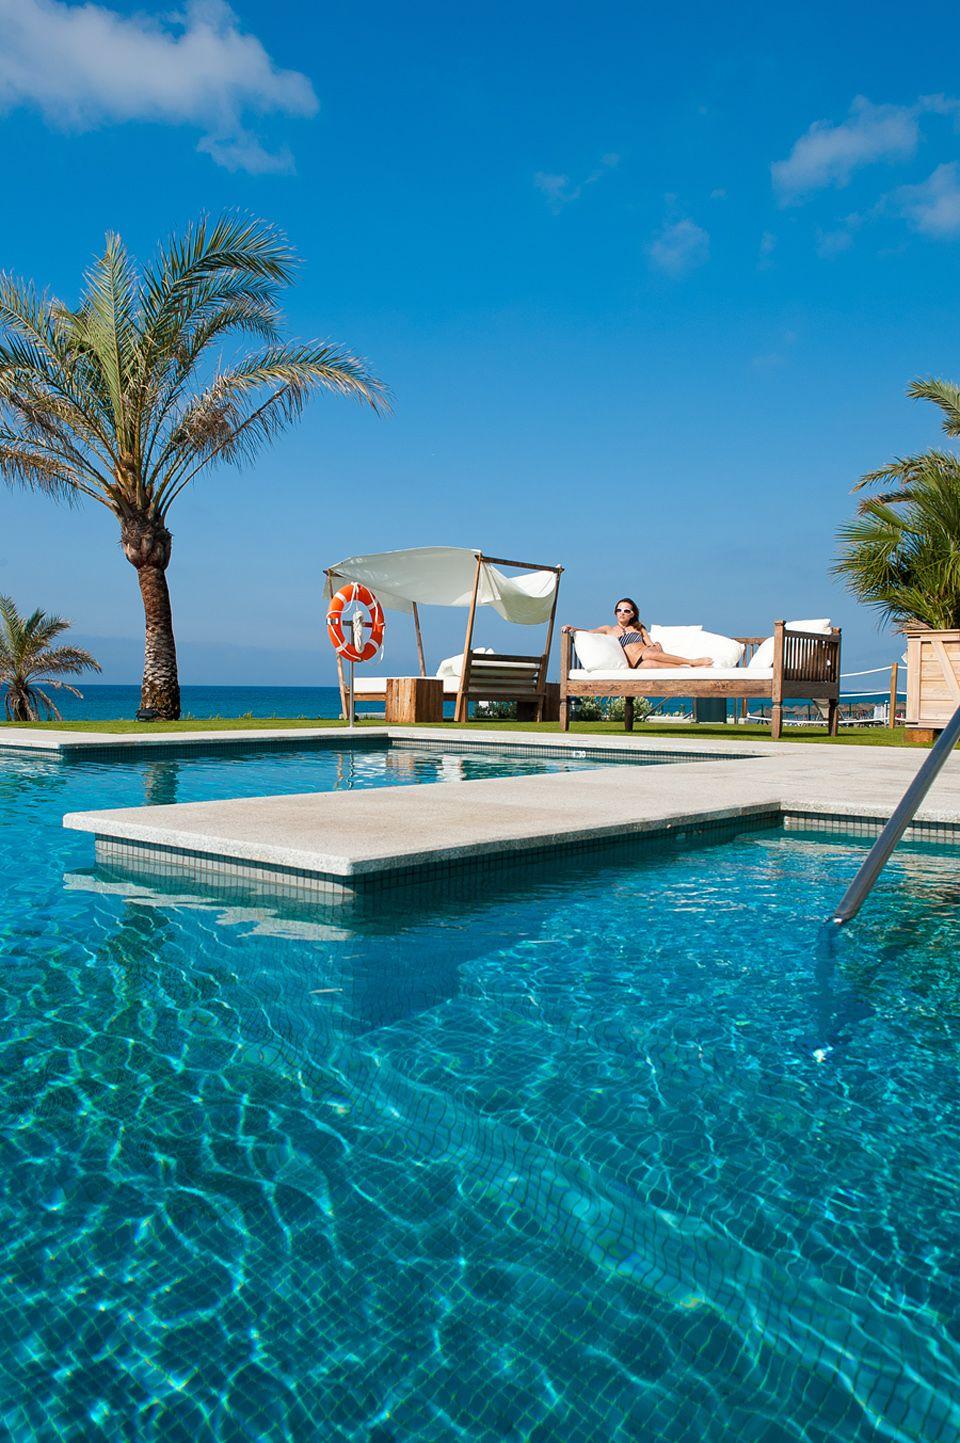 Hotel interior designs at beach club estrella del mar - Estrella del mar beach club ...